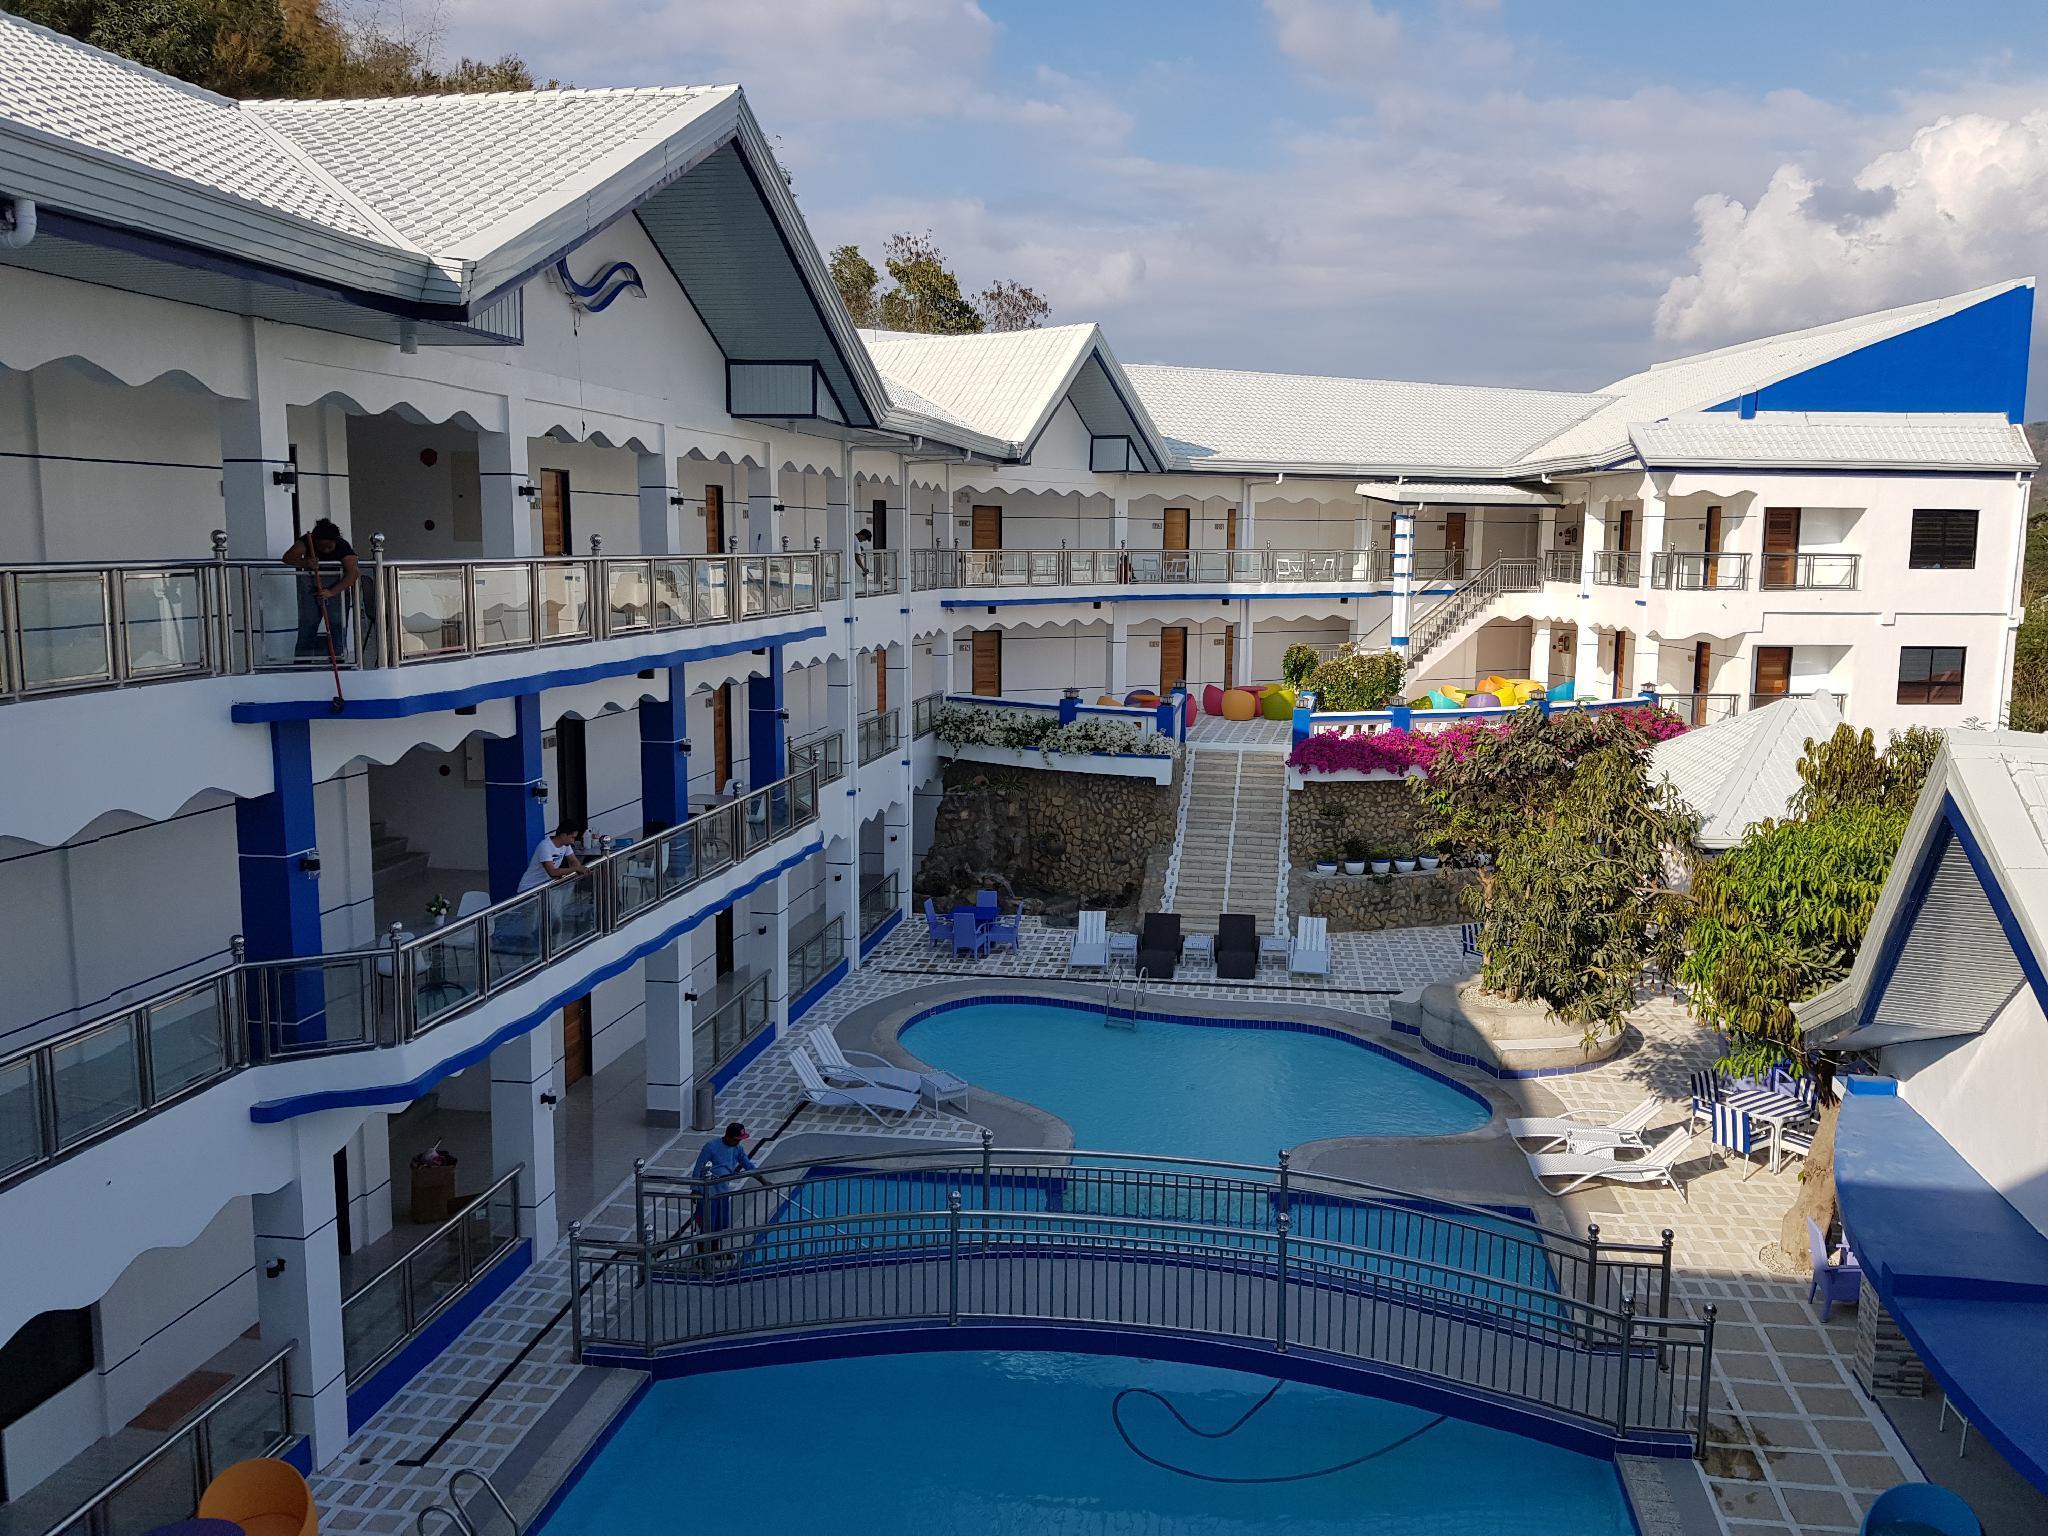 Santiago Cove Hotel And Restaurant